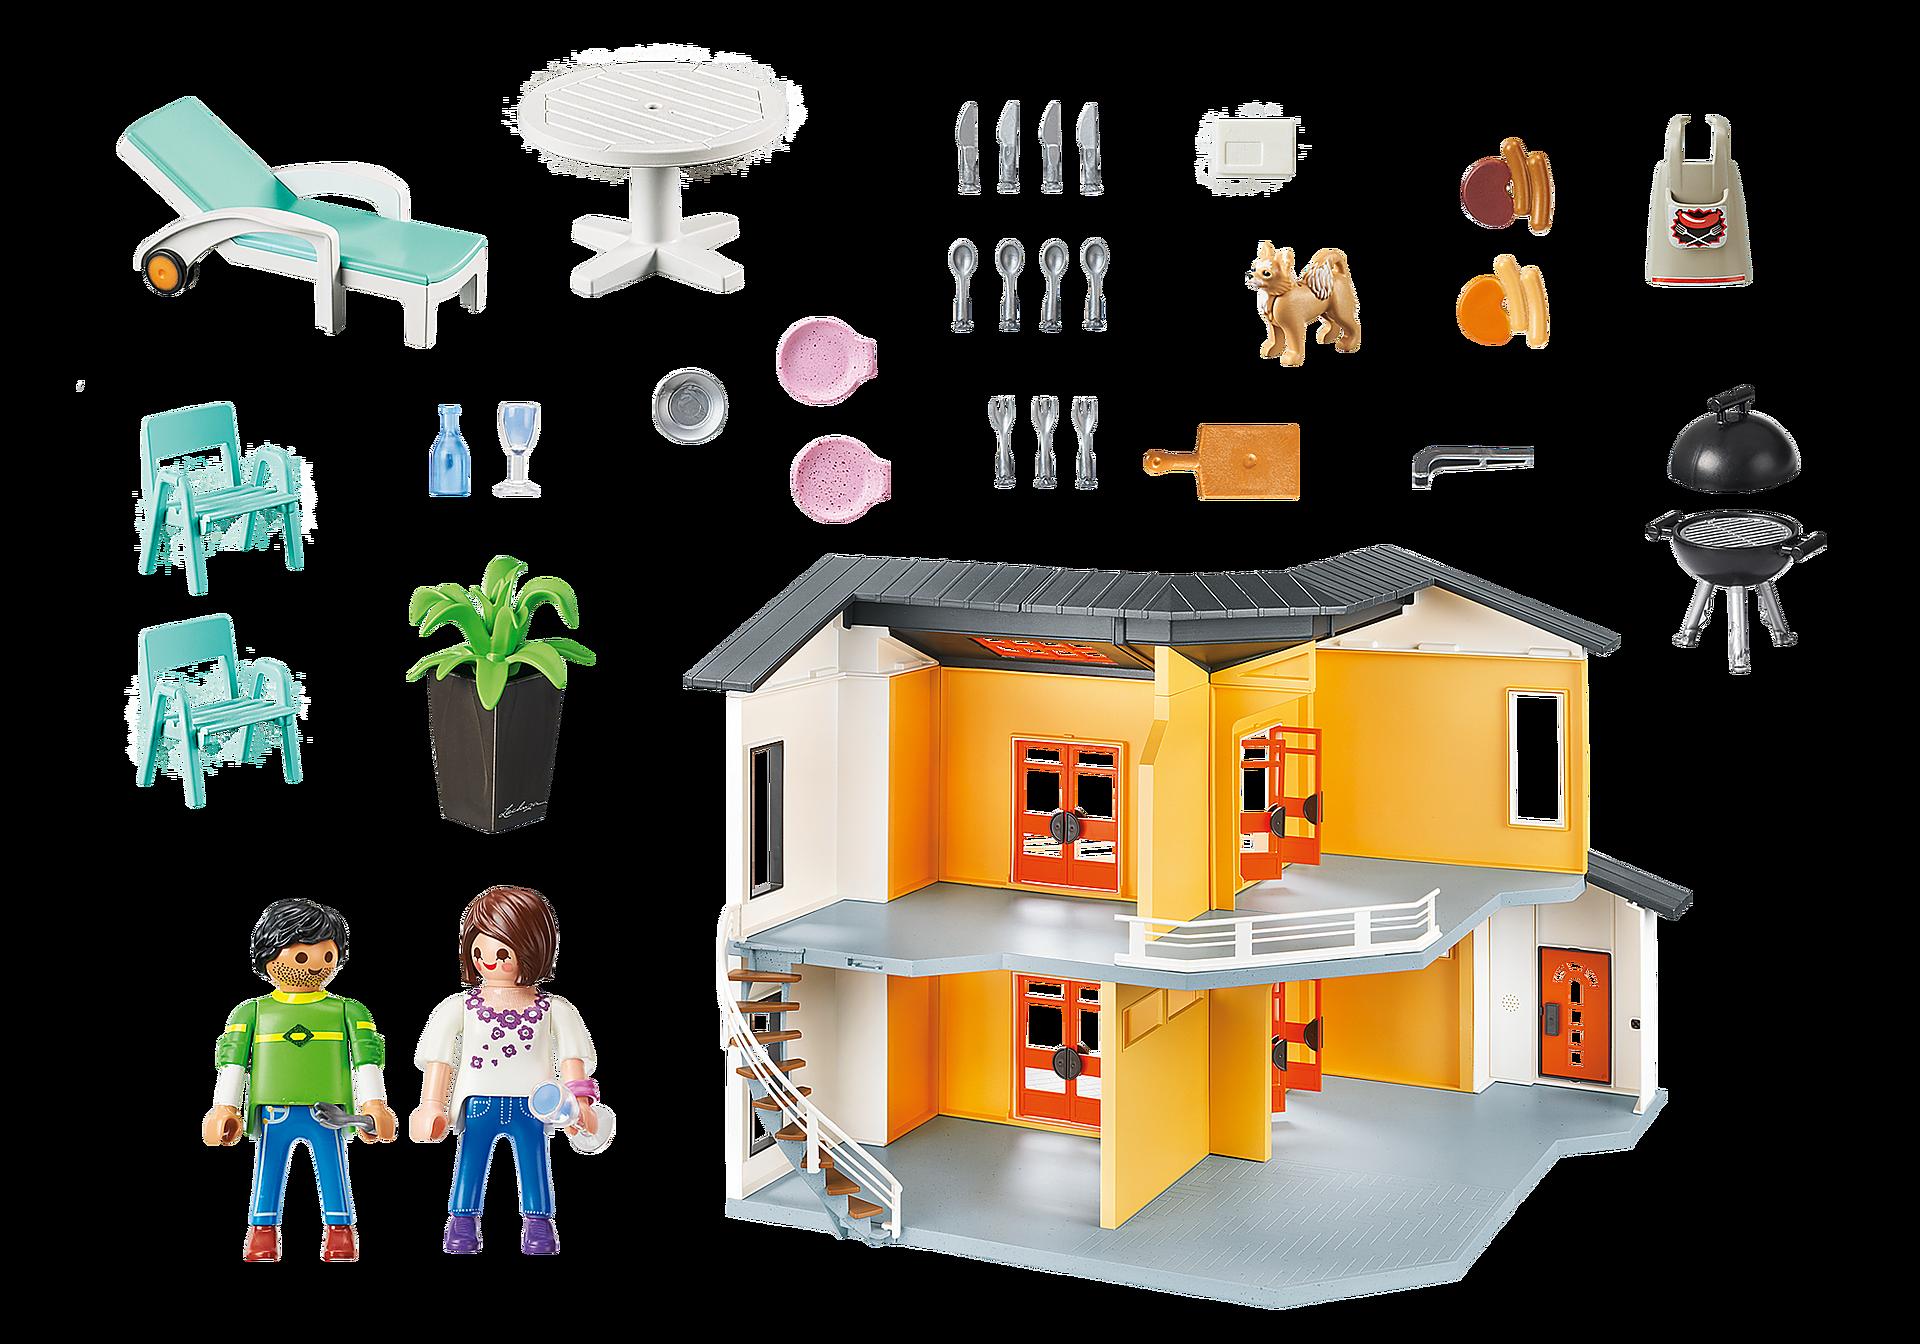 9266 Modernes Wohnhaus zoom image5